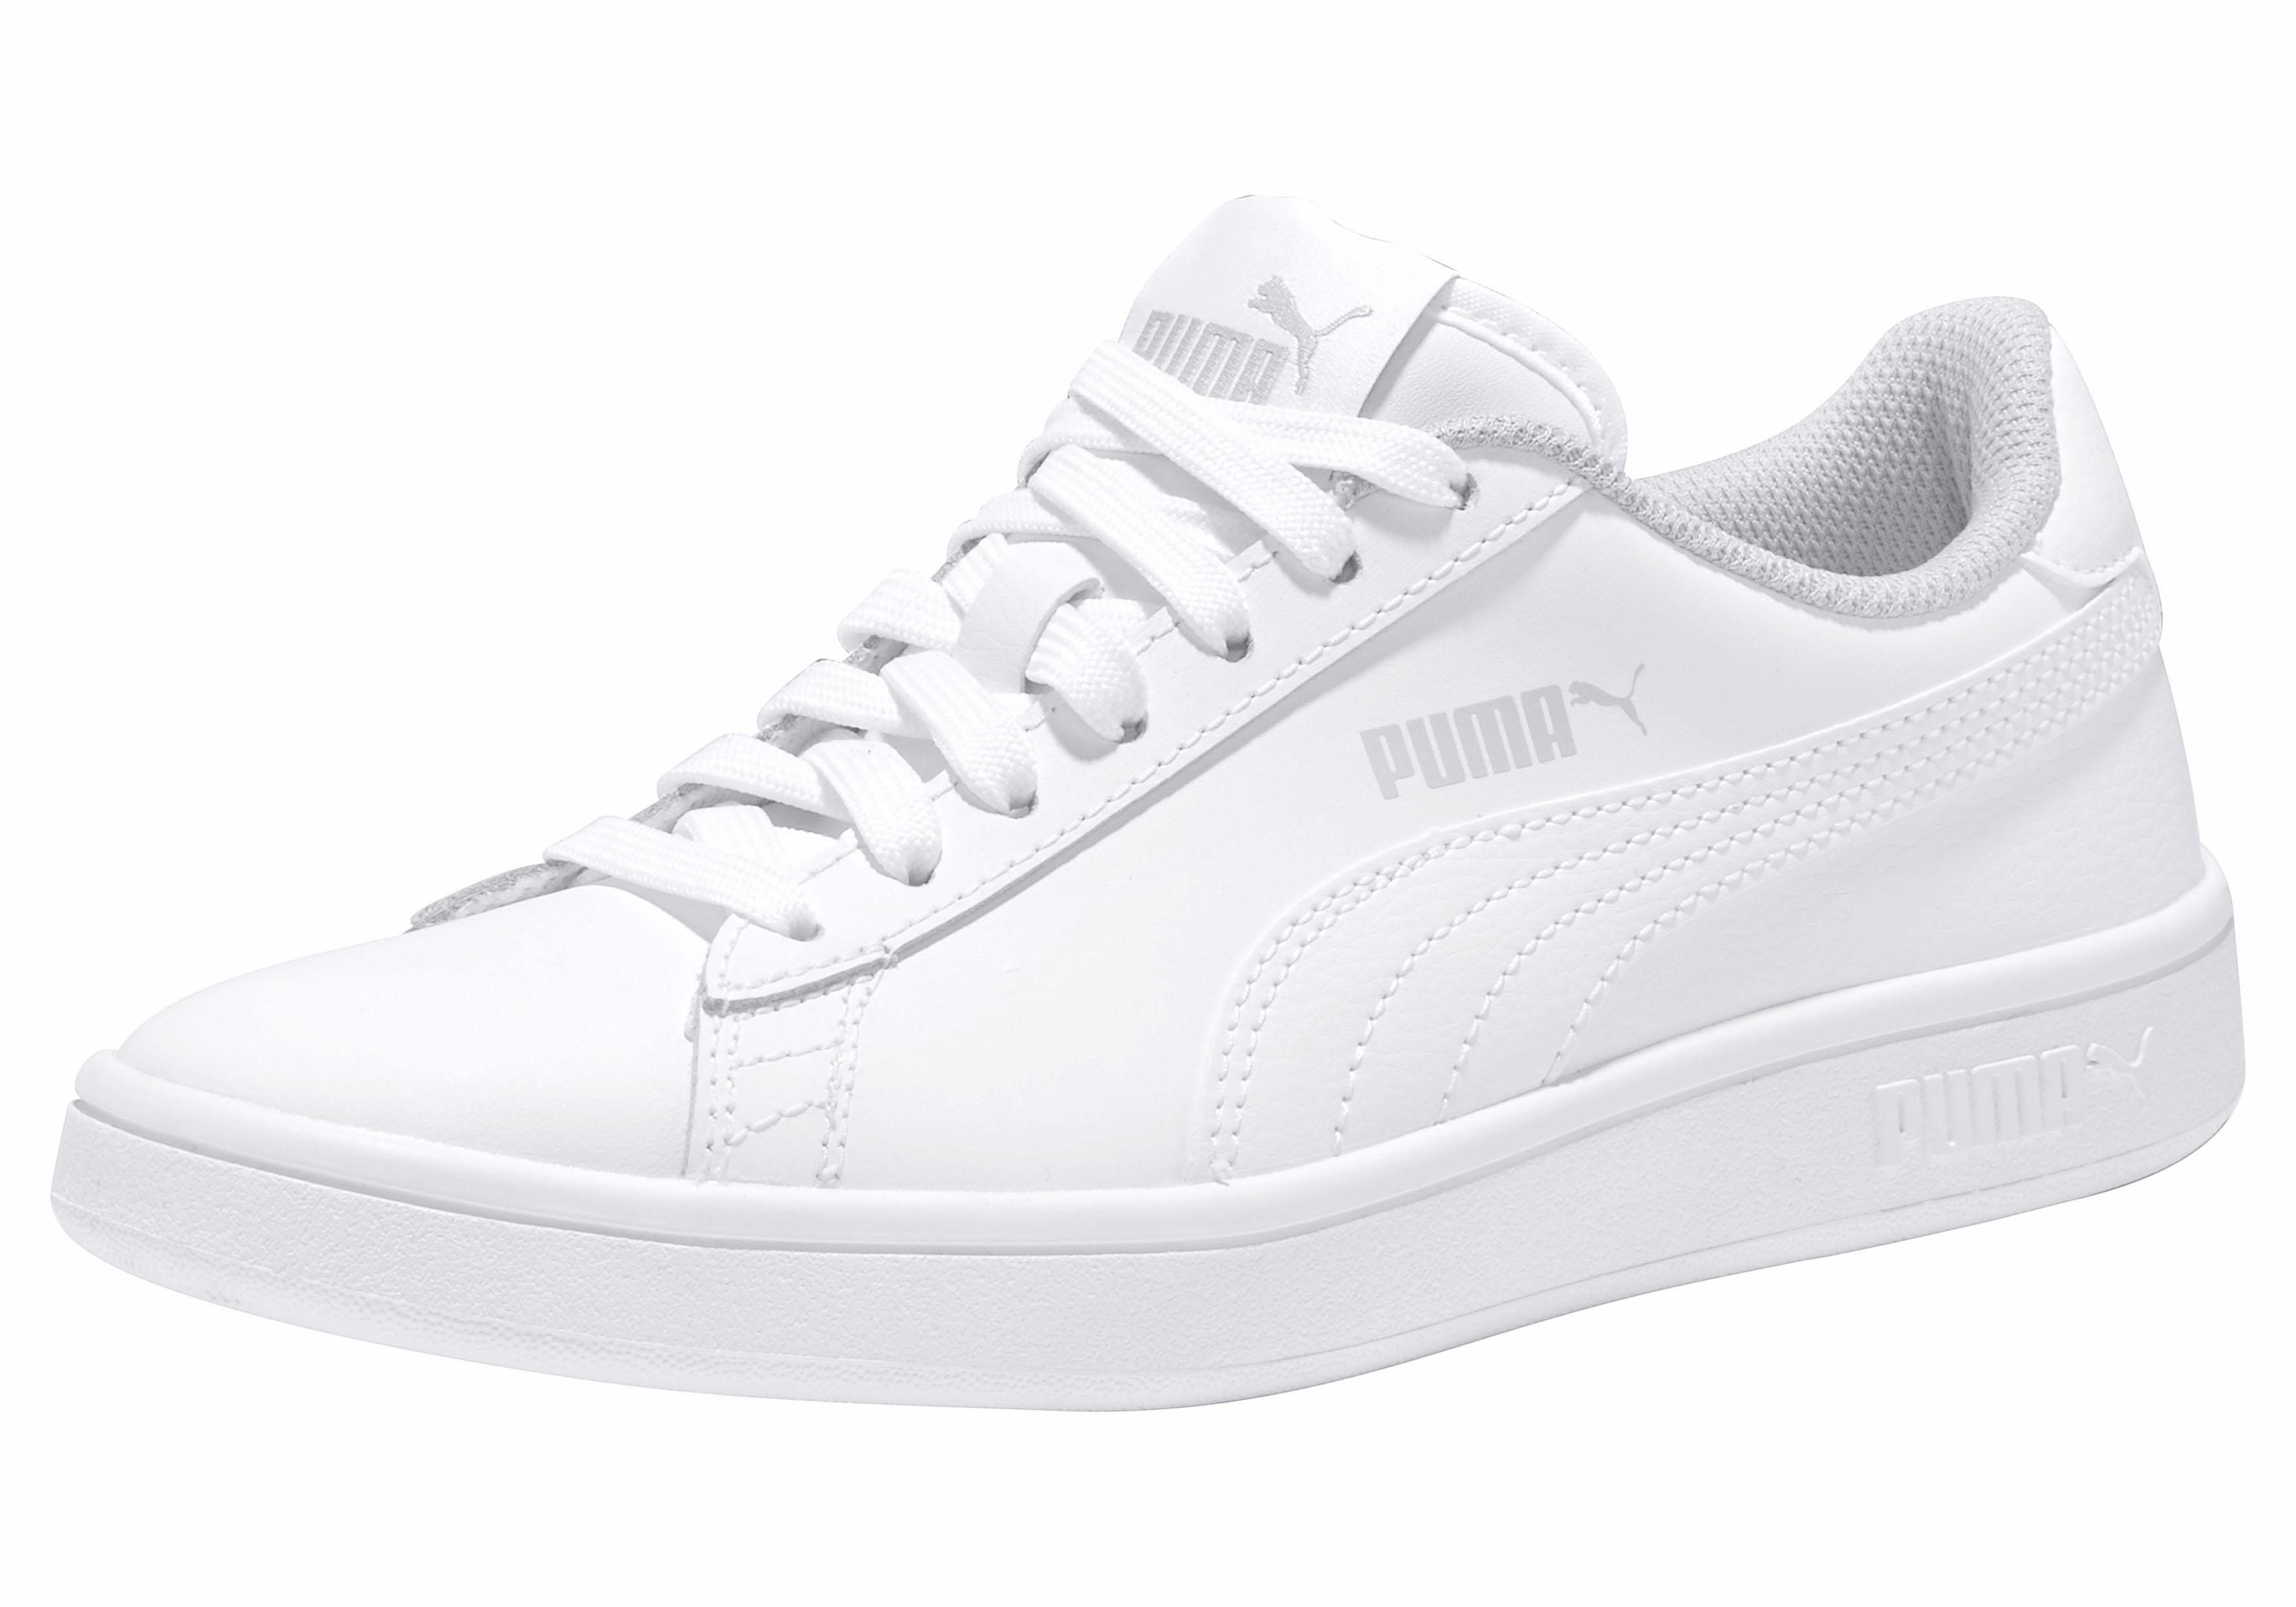 943ba5df0da PUMA sneakers »Smash v2 L Jr« makkelijk gevonden | OTTO